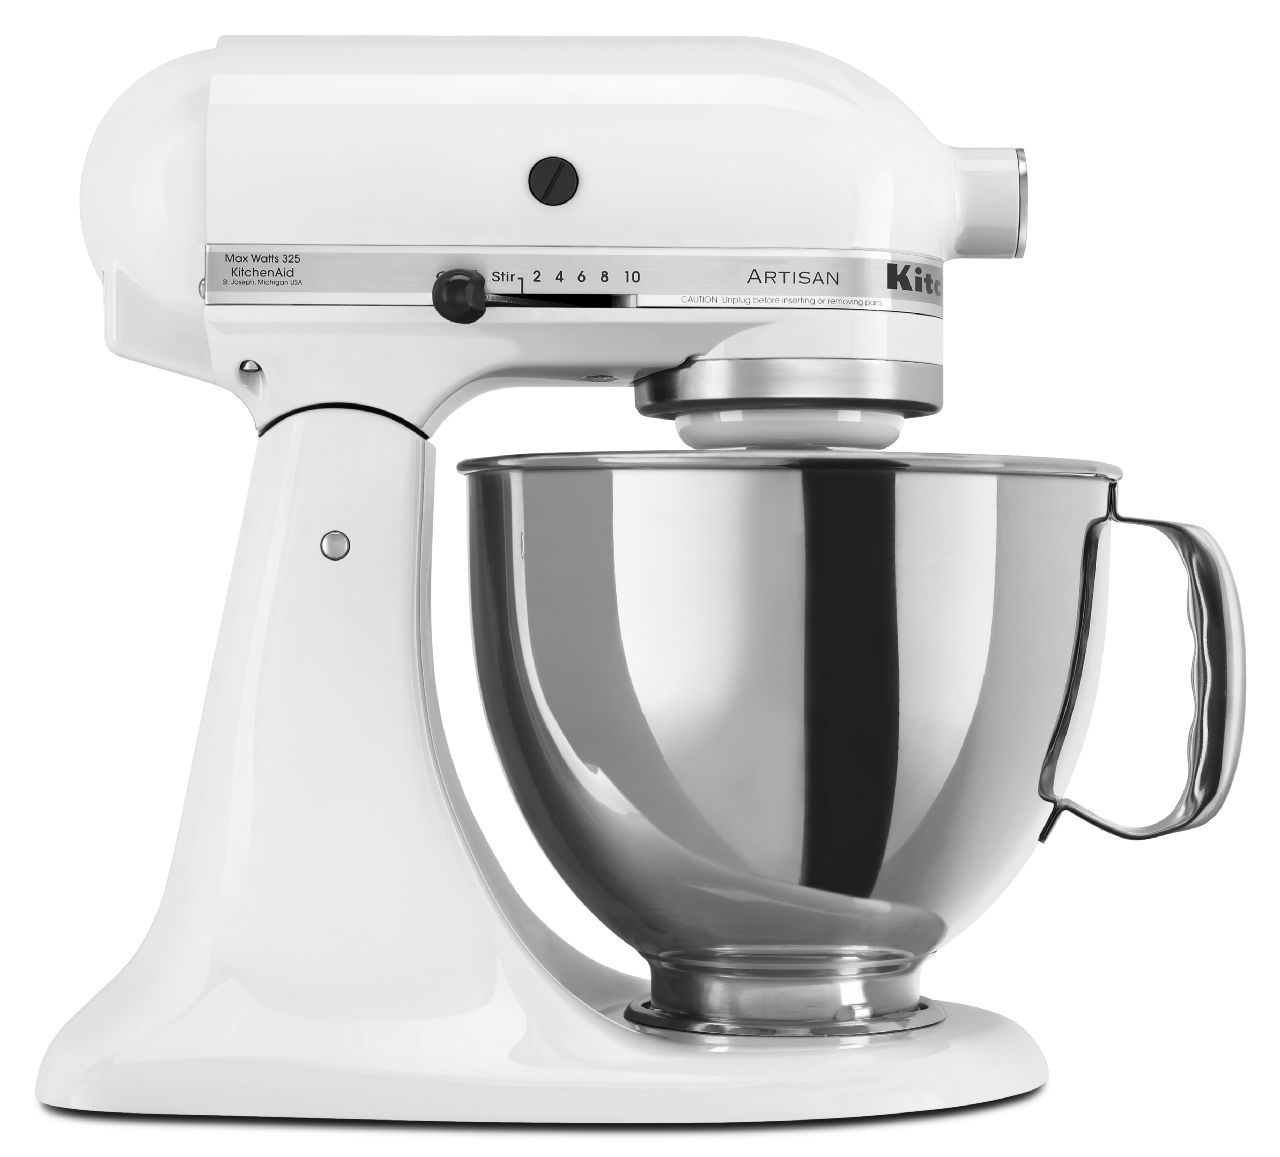 KitchenAid Artisan Series White Stand Mixer - KSM150PSWH on ice blue kitchenaid accessories, ice blue kitchenaid hand mixer, ice blue kitchenaid toaster,